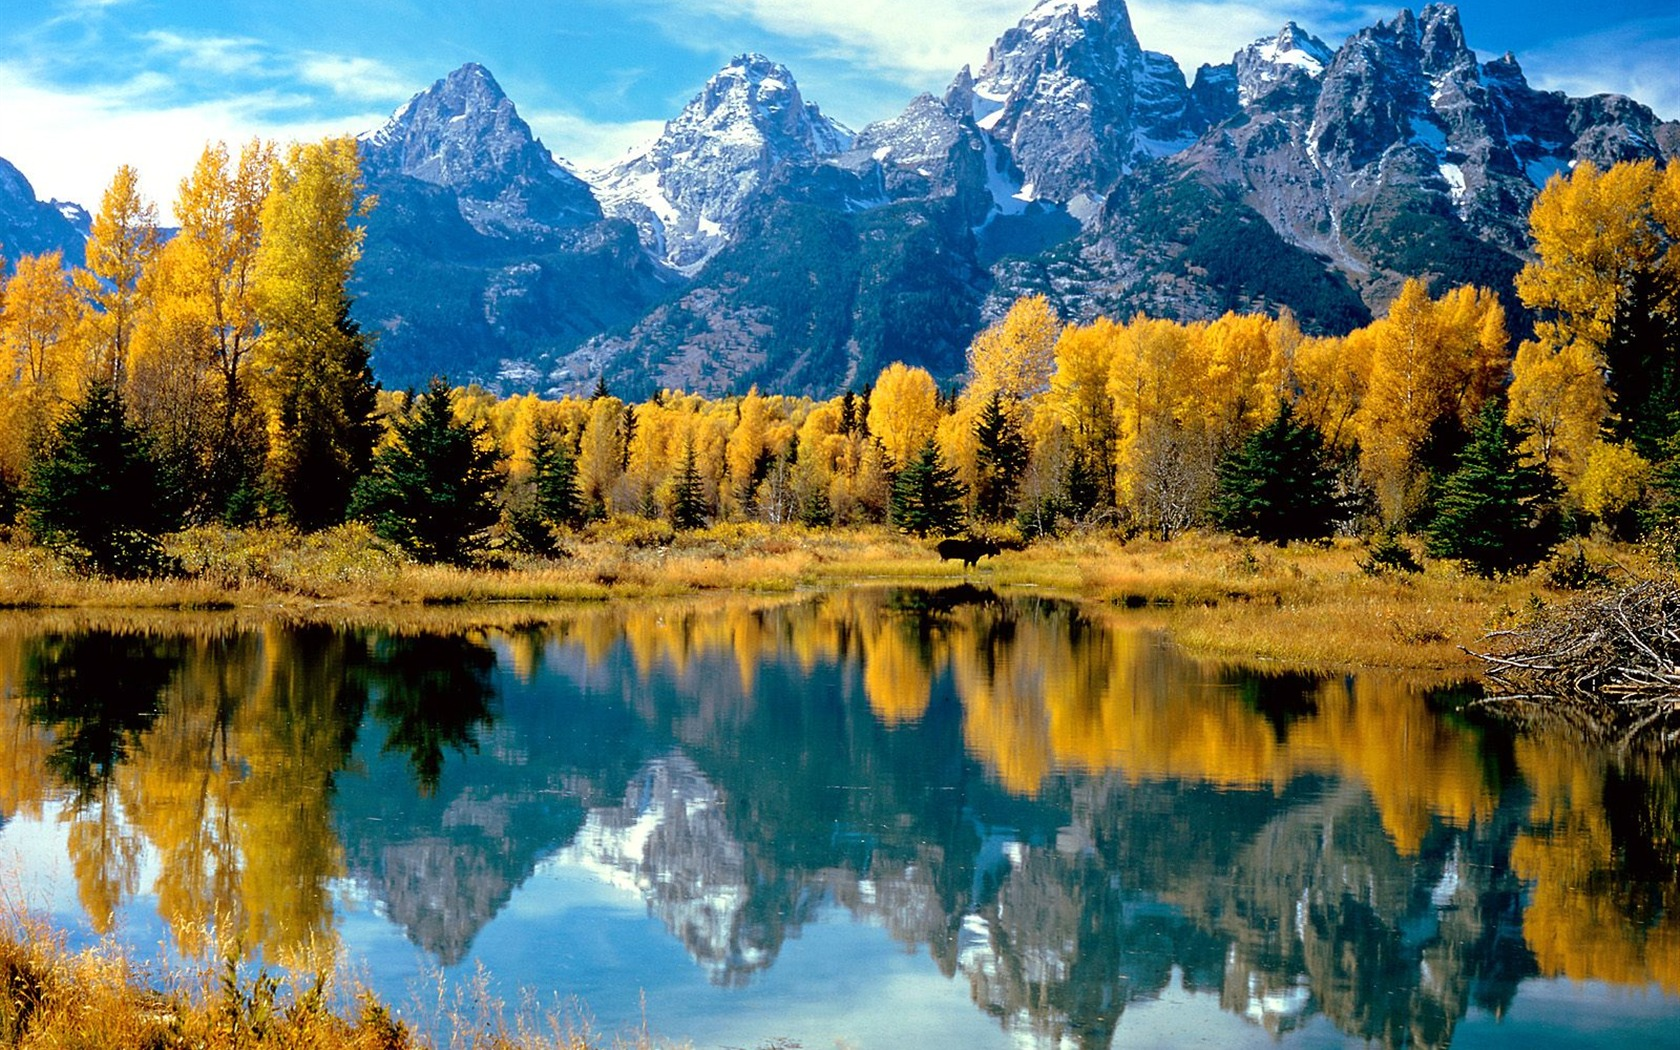 fond d 39 cran magnifiques paysages d 39 automne 19 1680x1050 fond d 39 cran t l charger fond d. Black Bedroom Furniture Sets. Home Design Ideas